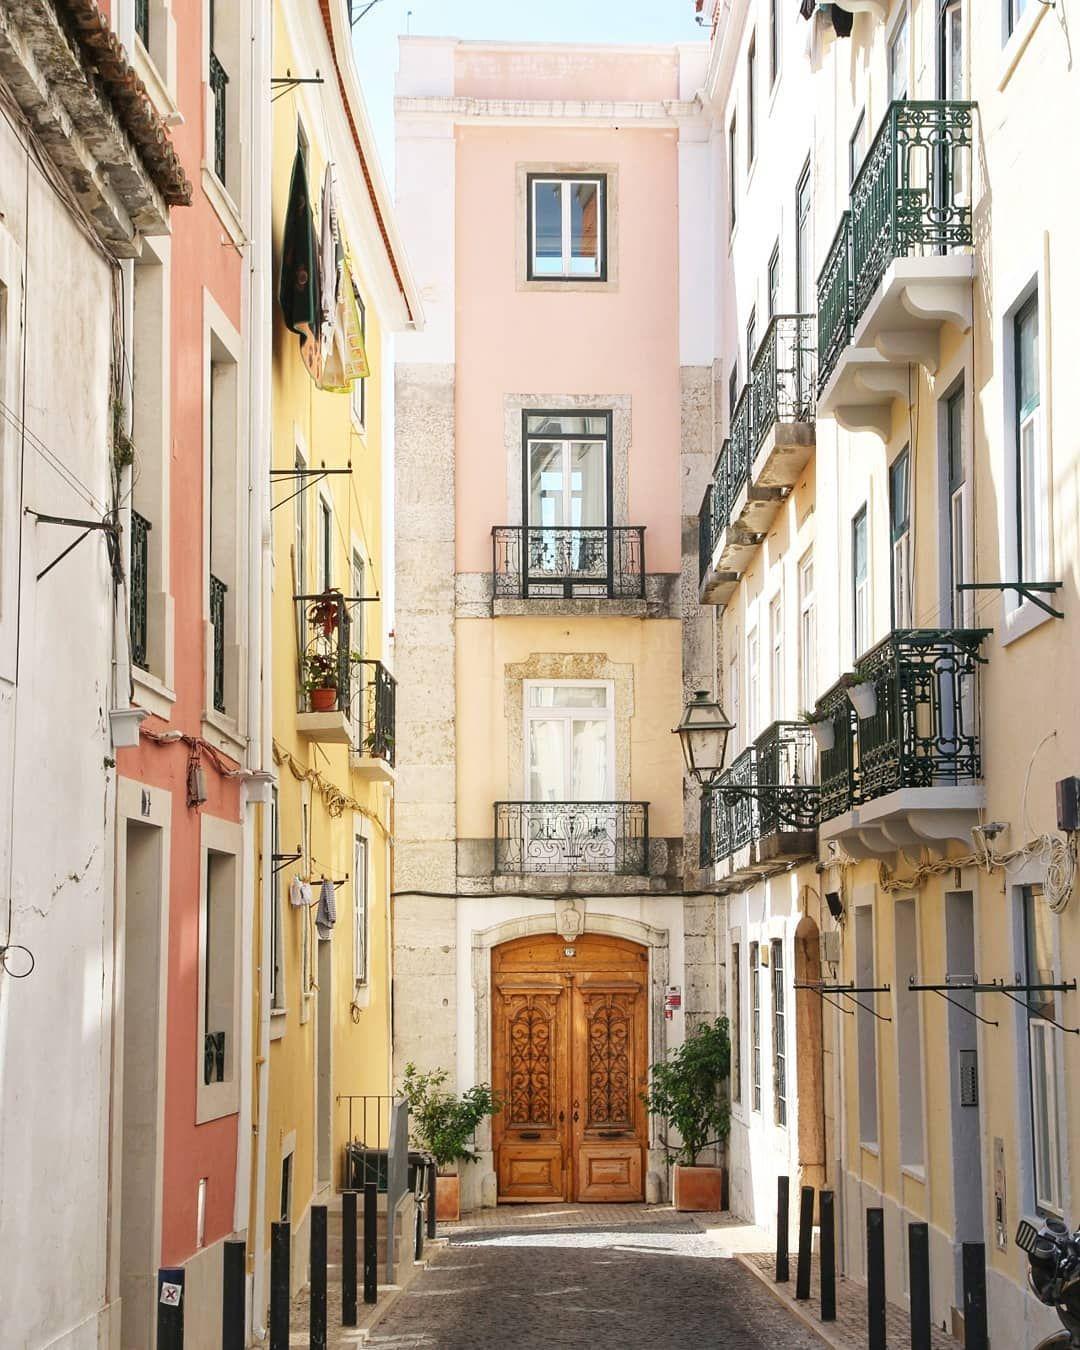 Sonntags Im Bairro Alto Bairroalto Lissabon Lisbon Portugal Urlaubinportugal Unterwegs Reise Reiseblogg Wonders Of The World Visit Lisboa Places To Go